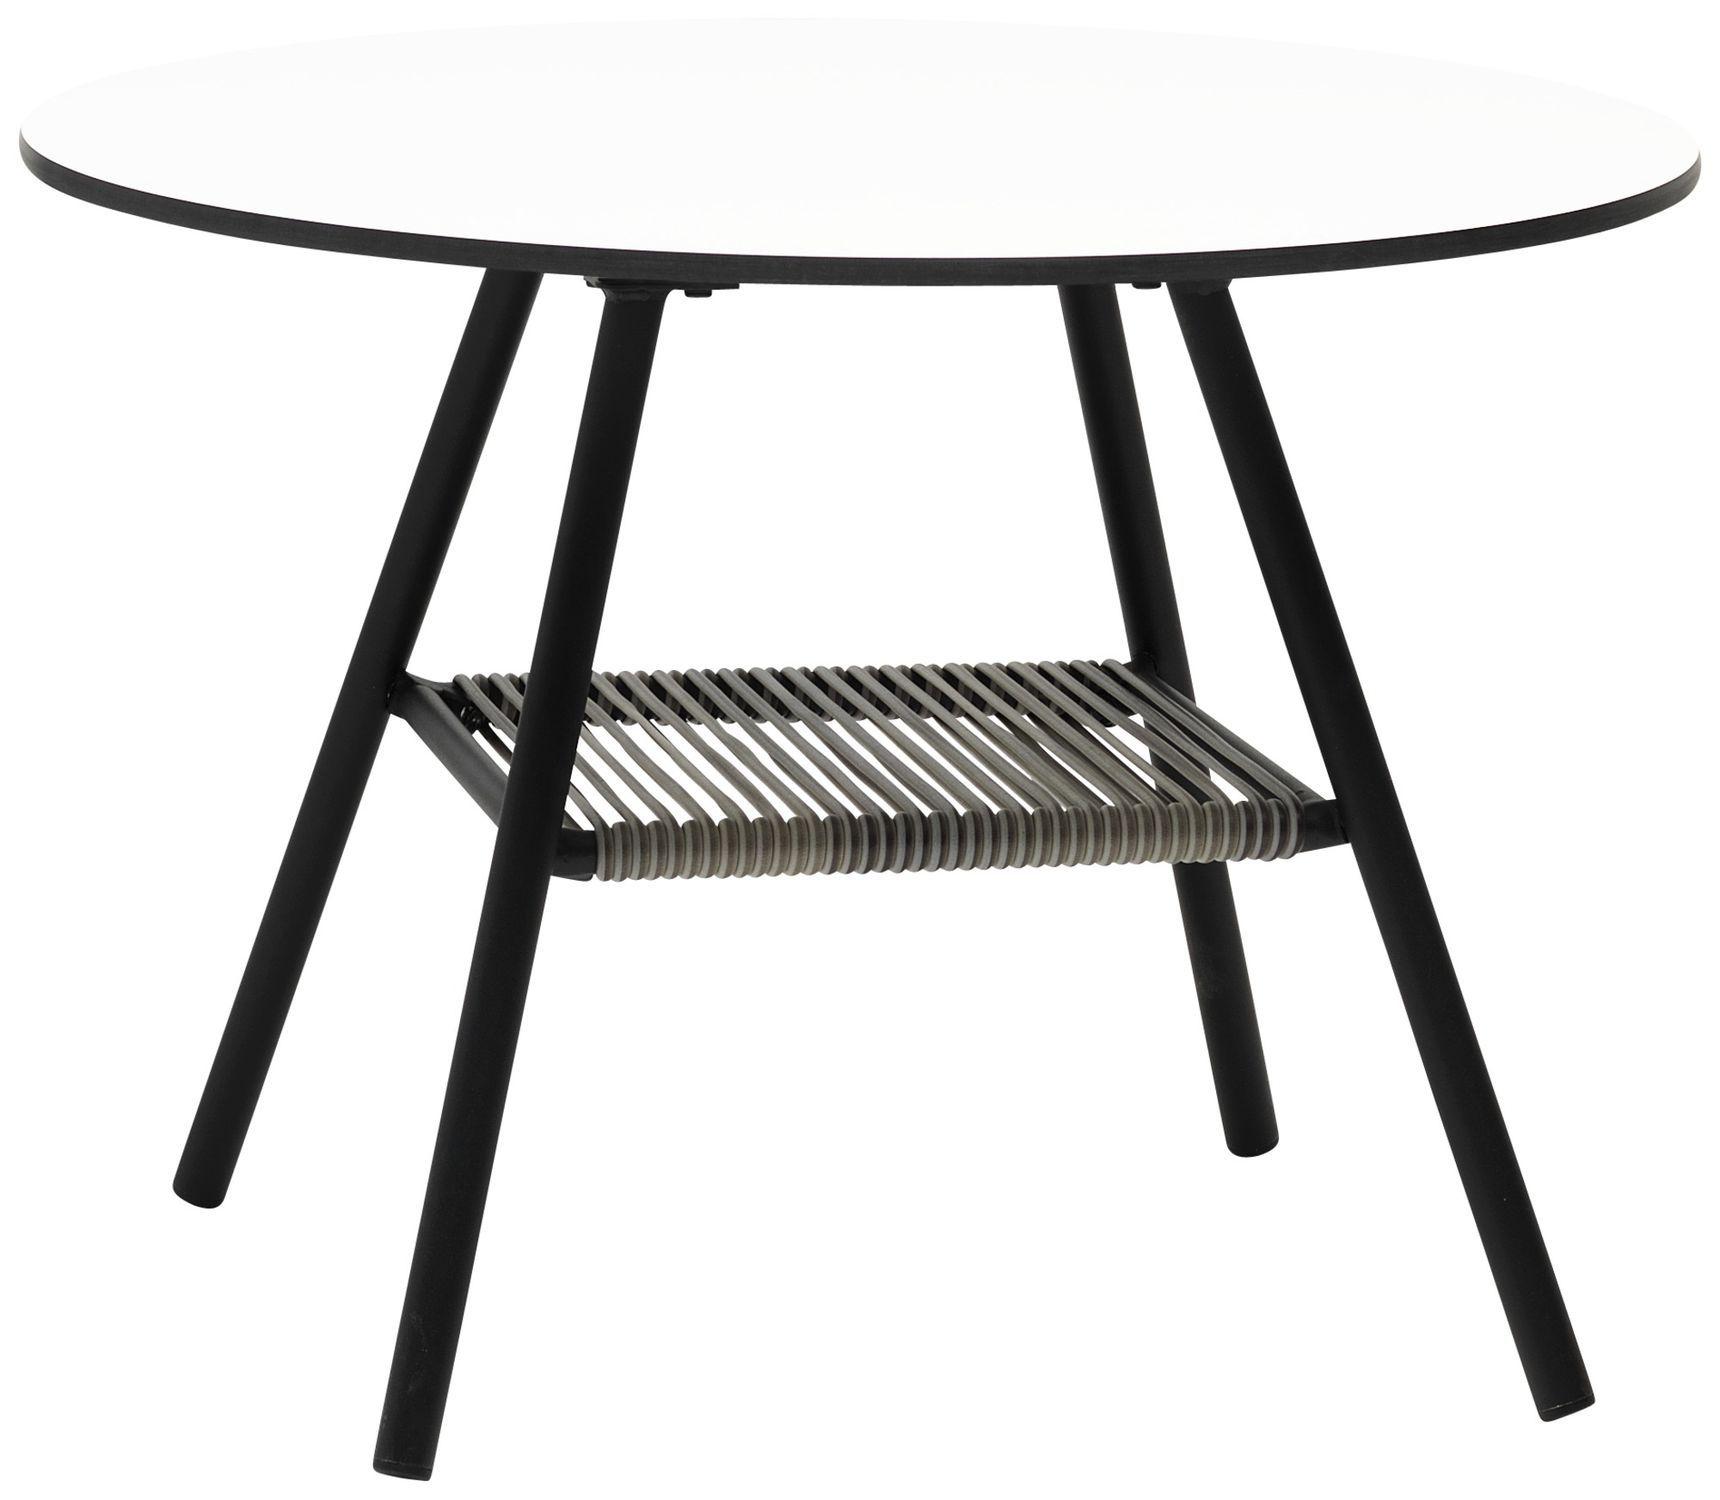 Moderner Tisch Stahl Laminat Rechteckig Elba Boconcept